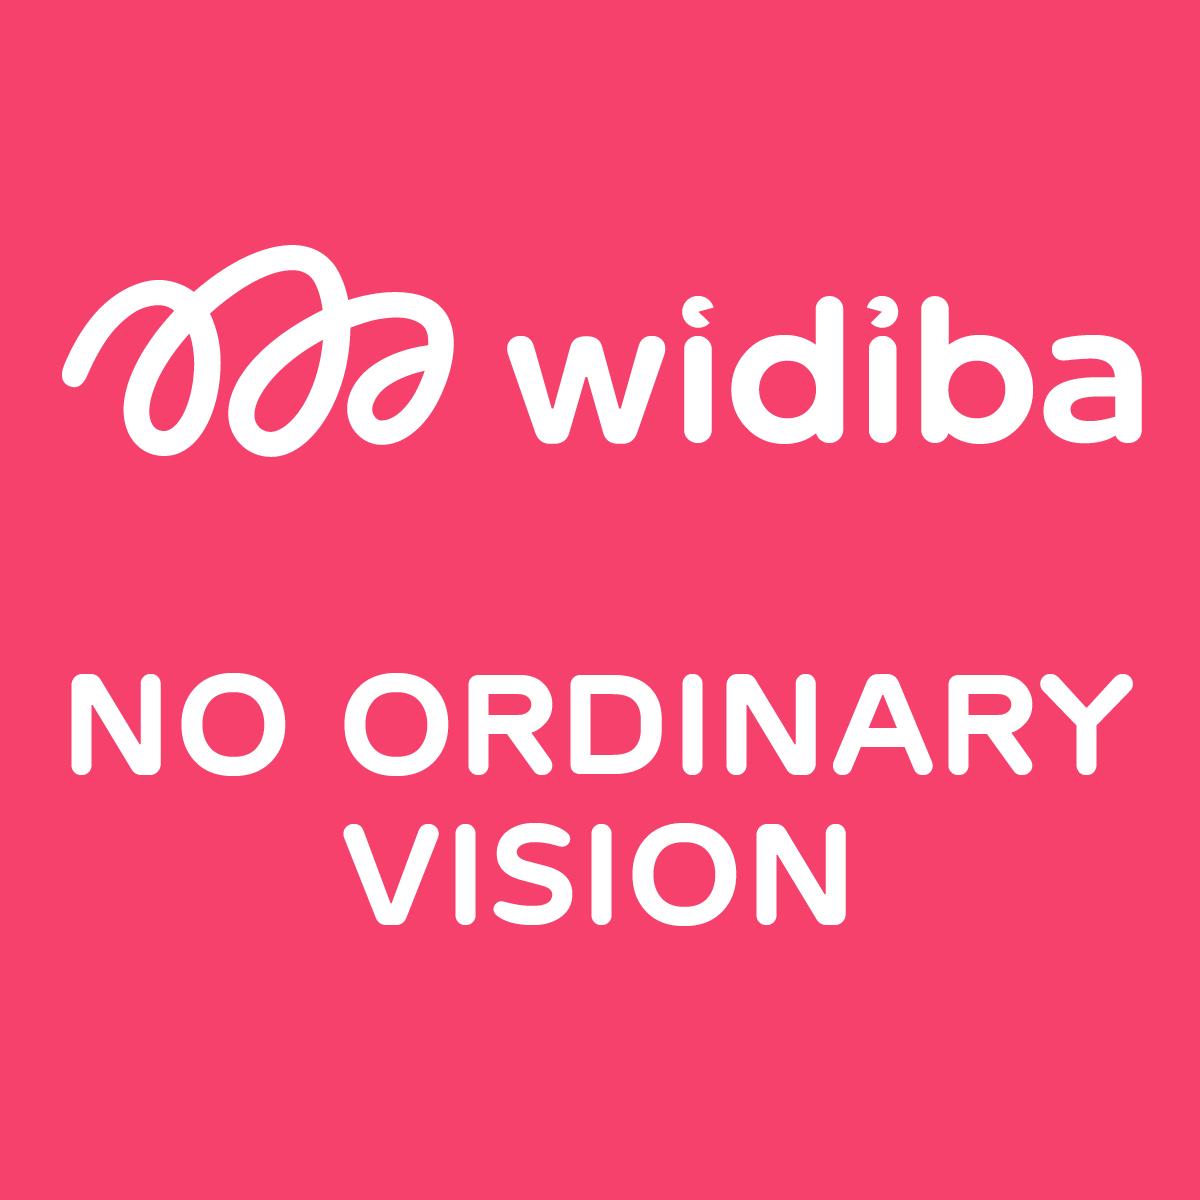 WIDIBA_image-size-promo_1200x1200